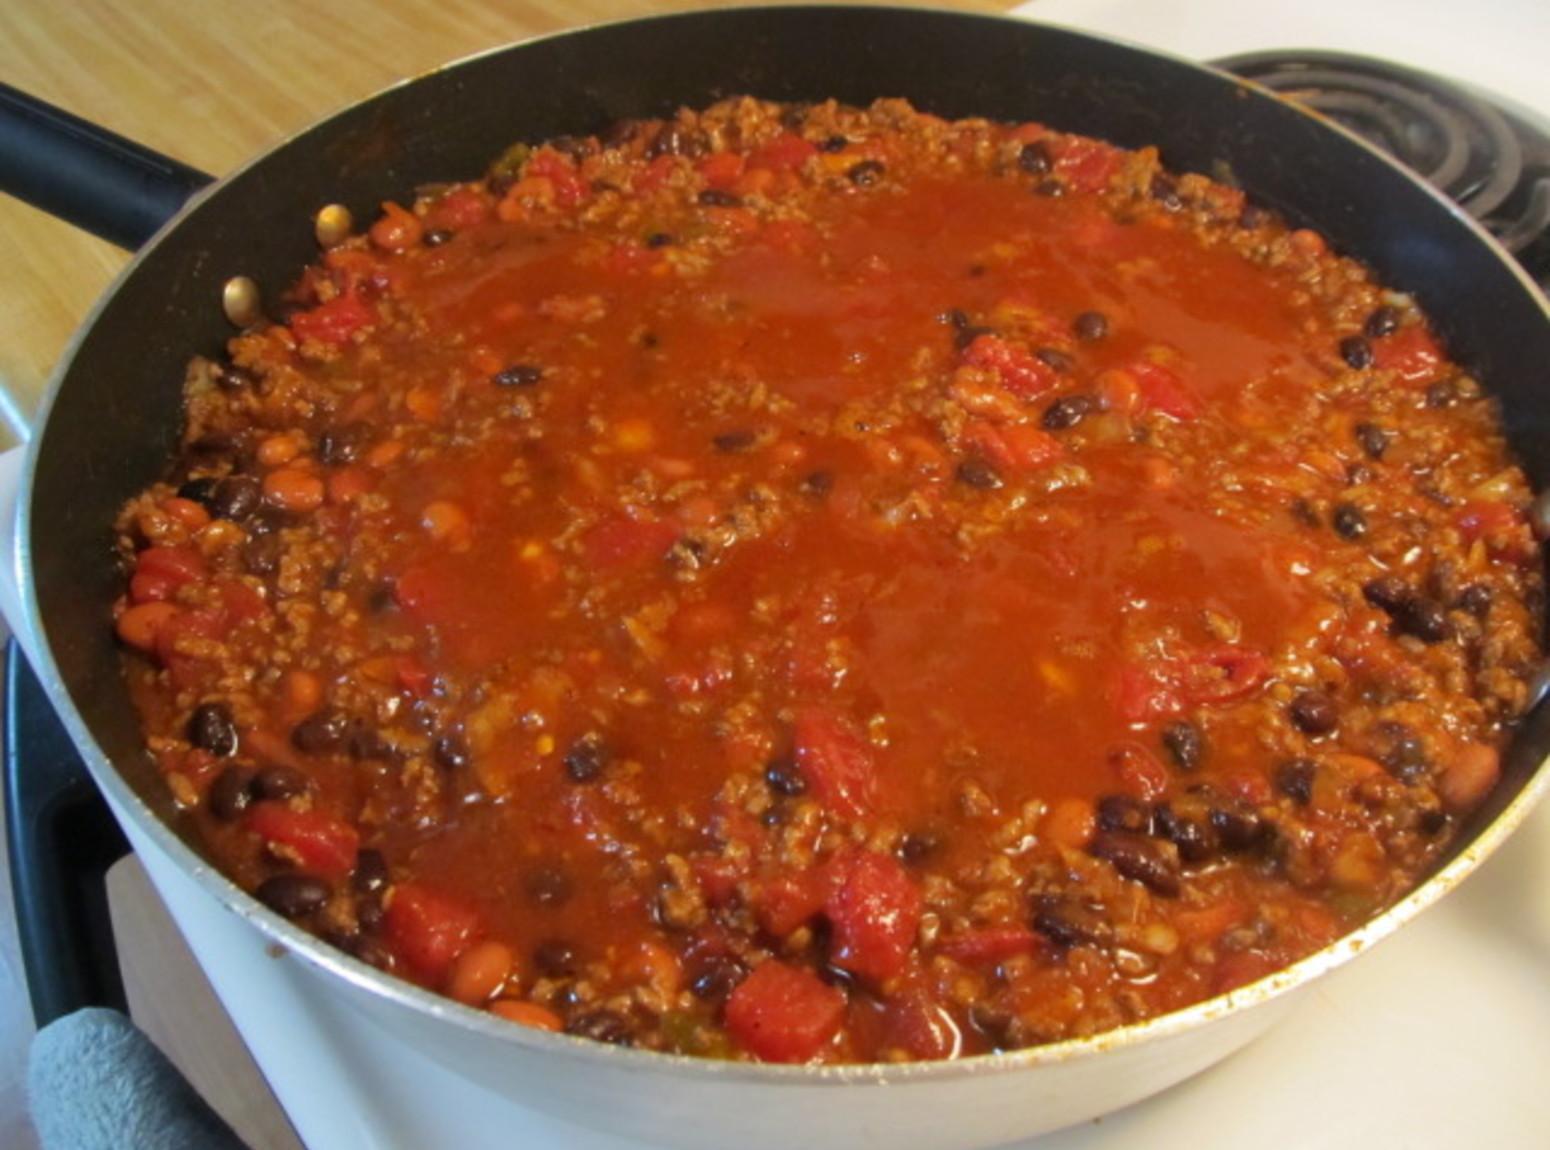 Ground Beef Chili Recipes  Ground Beef Chili Recipe